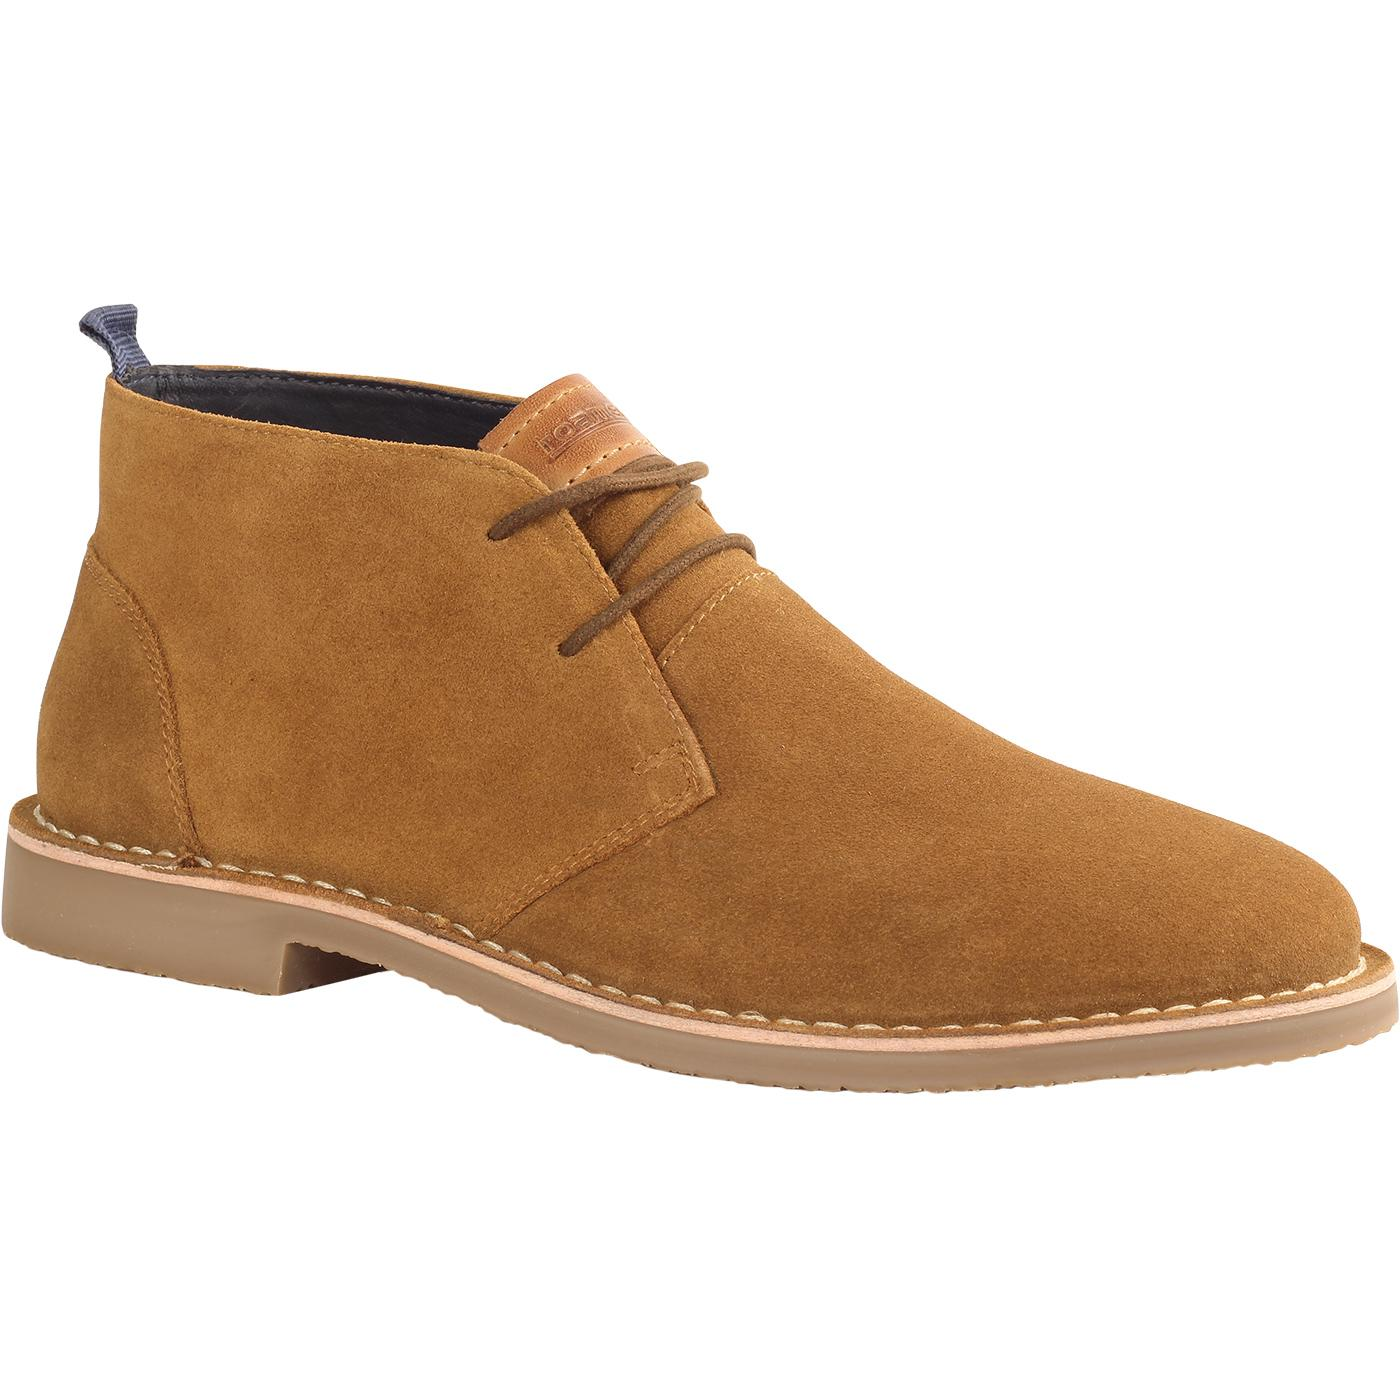 Men's Retro Mod Classic Suede Desert Boots (Tan)